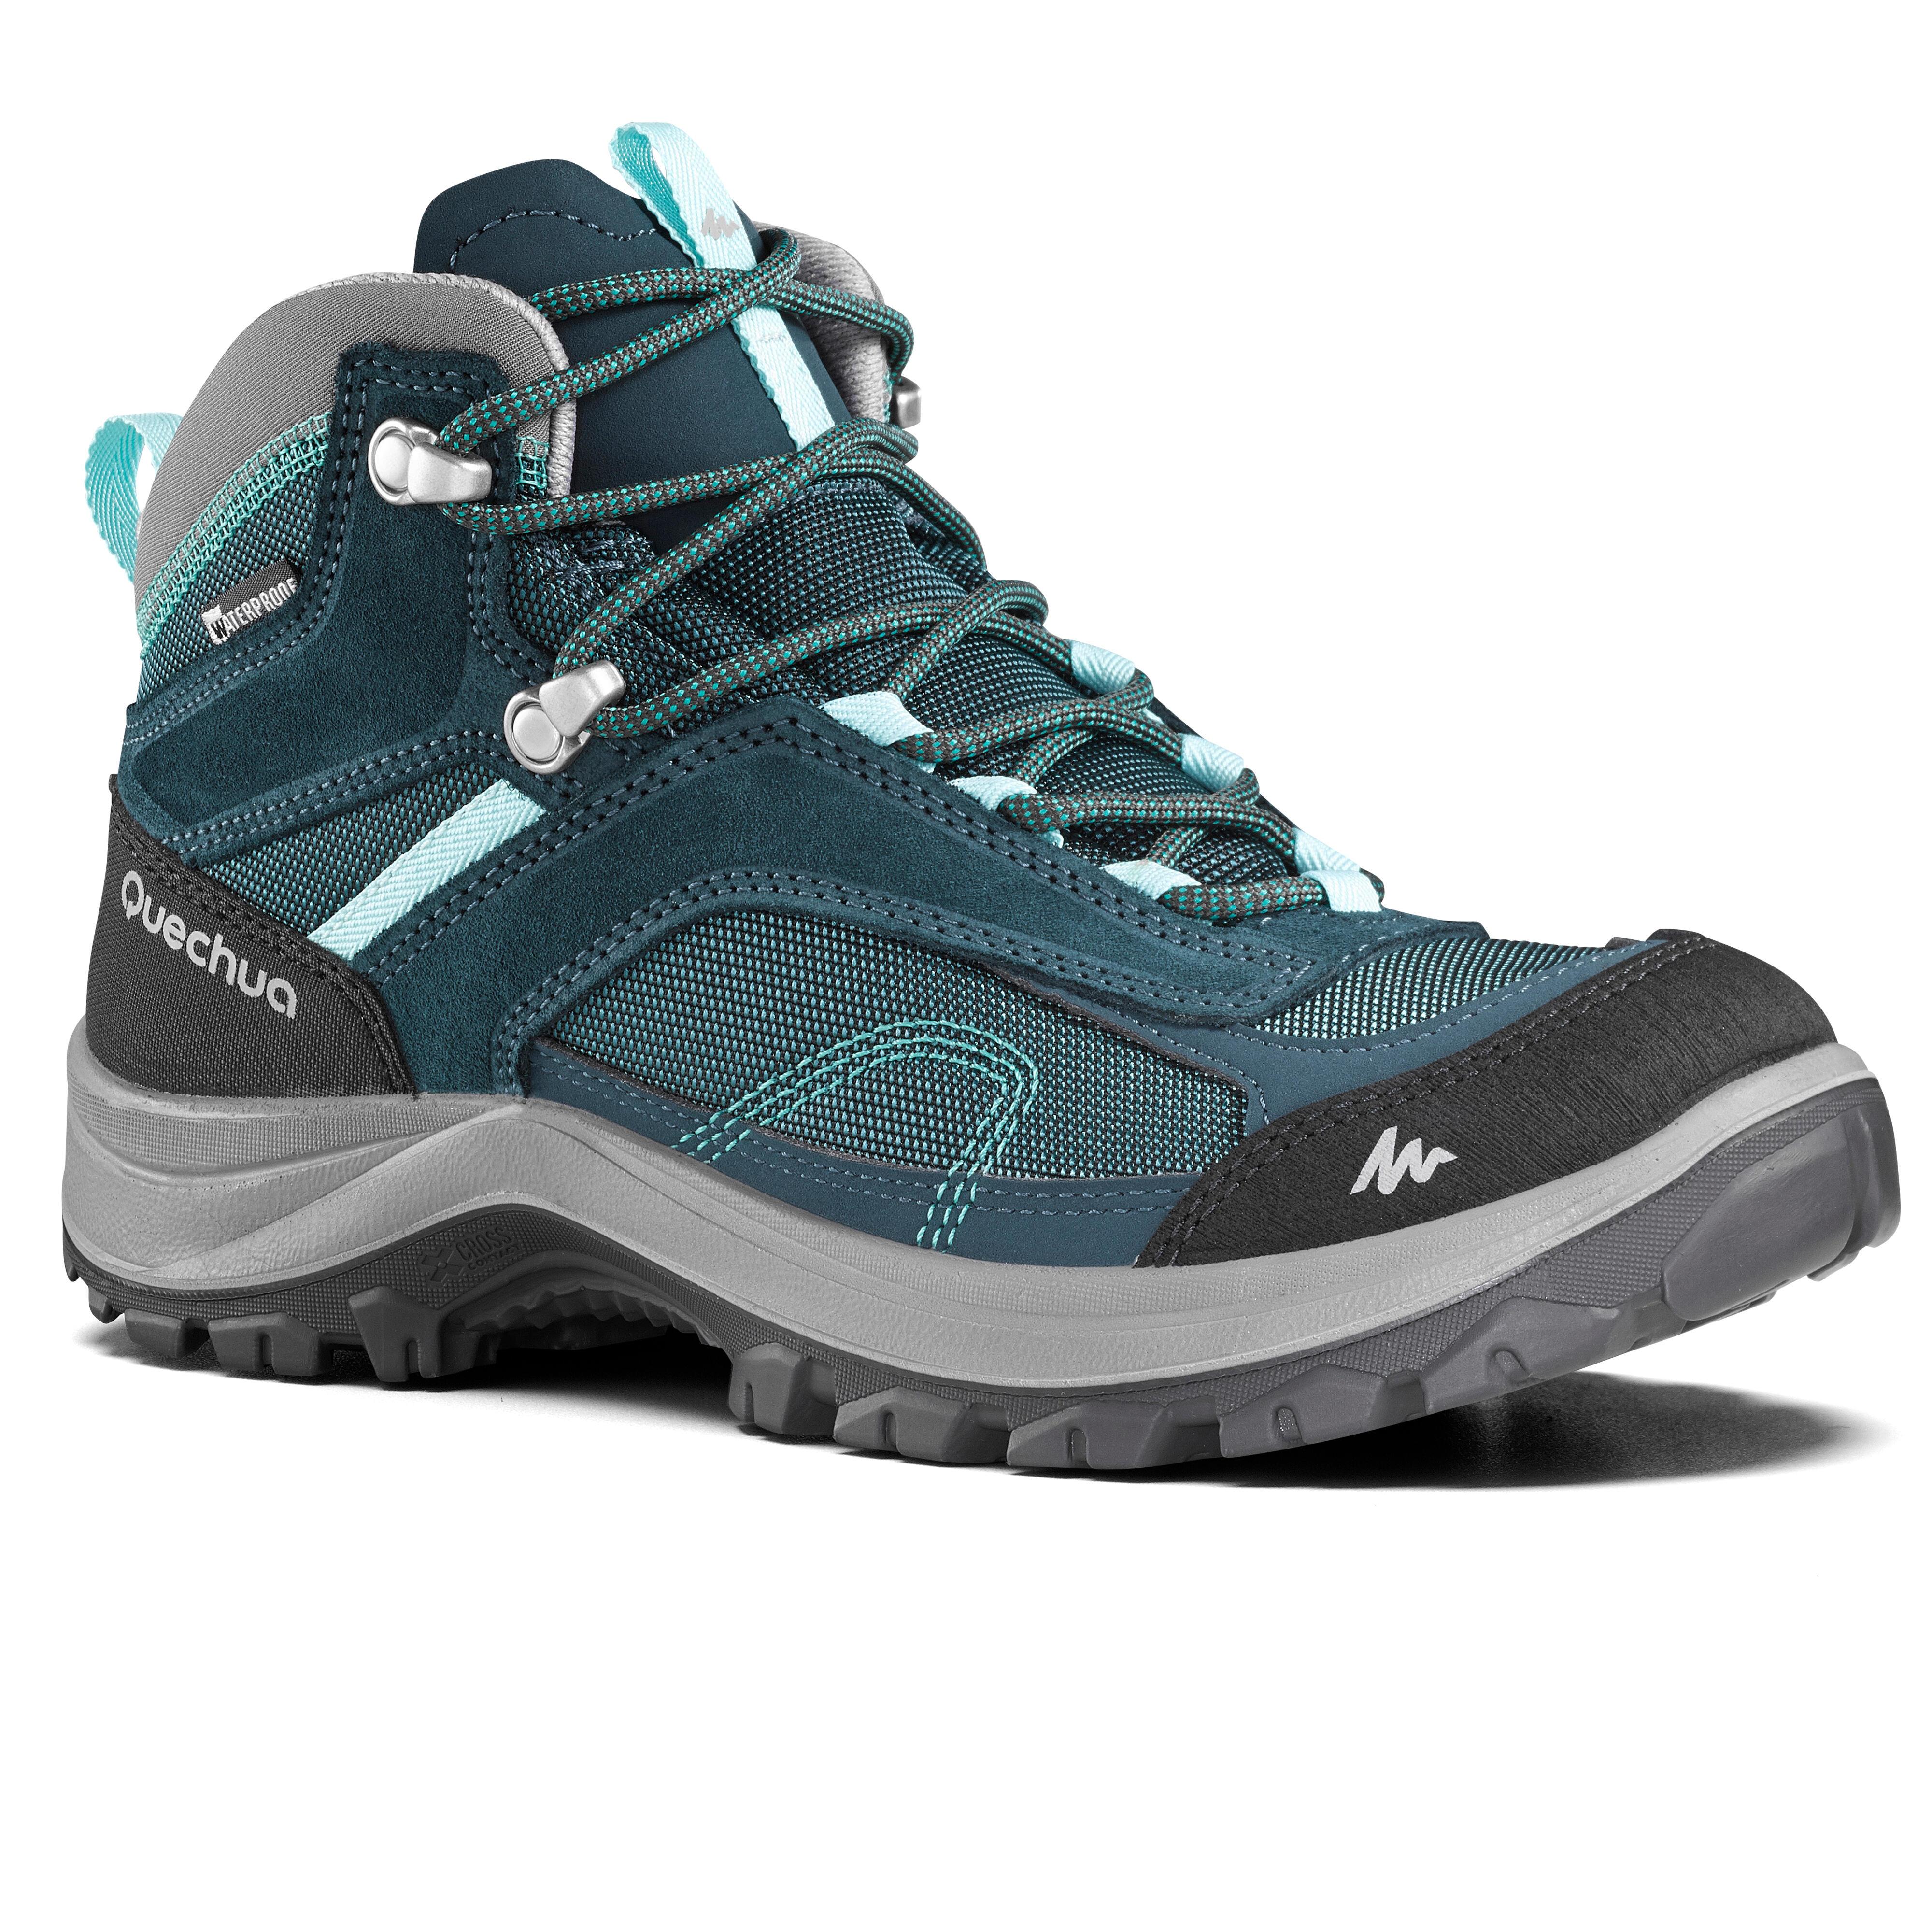 Botas Montaña Azul Mid Turquesa De Impermeables Mh100 Senderismo Mujer 34L5jAR